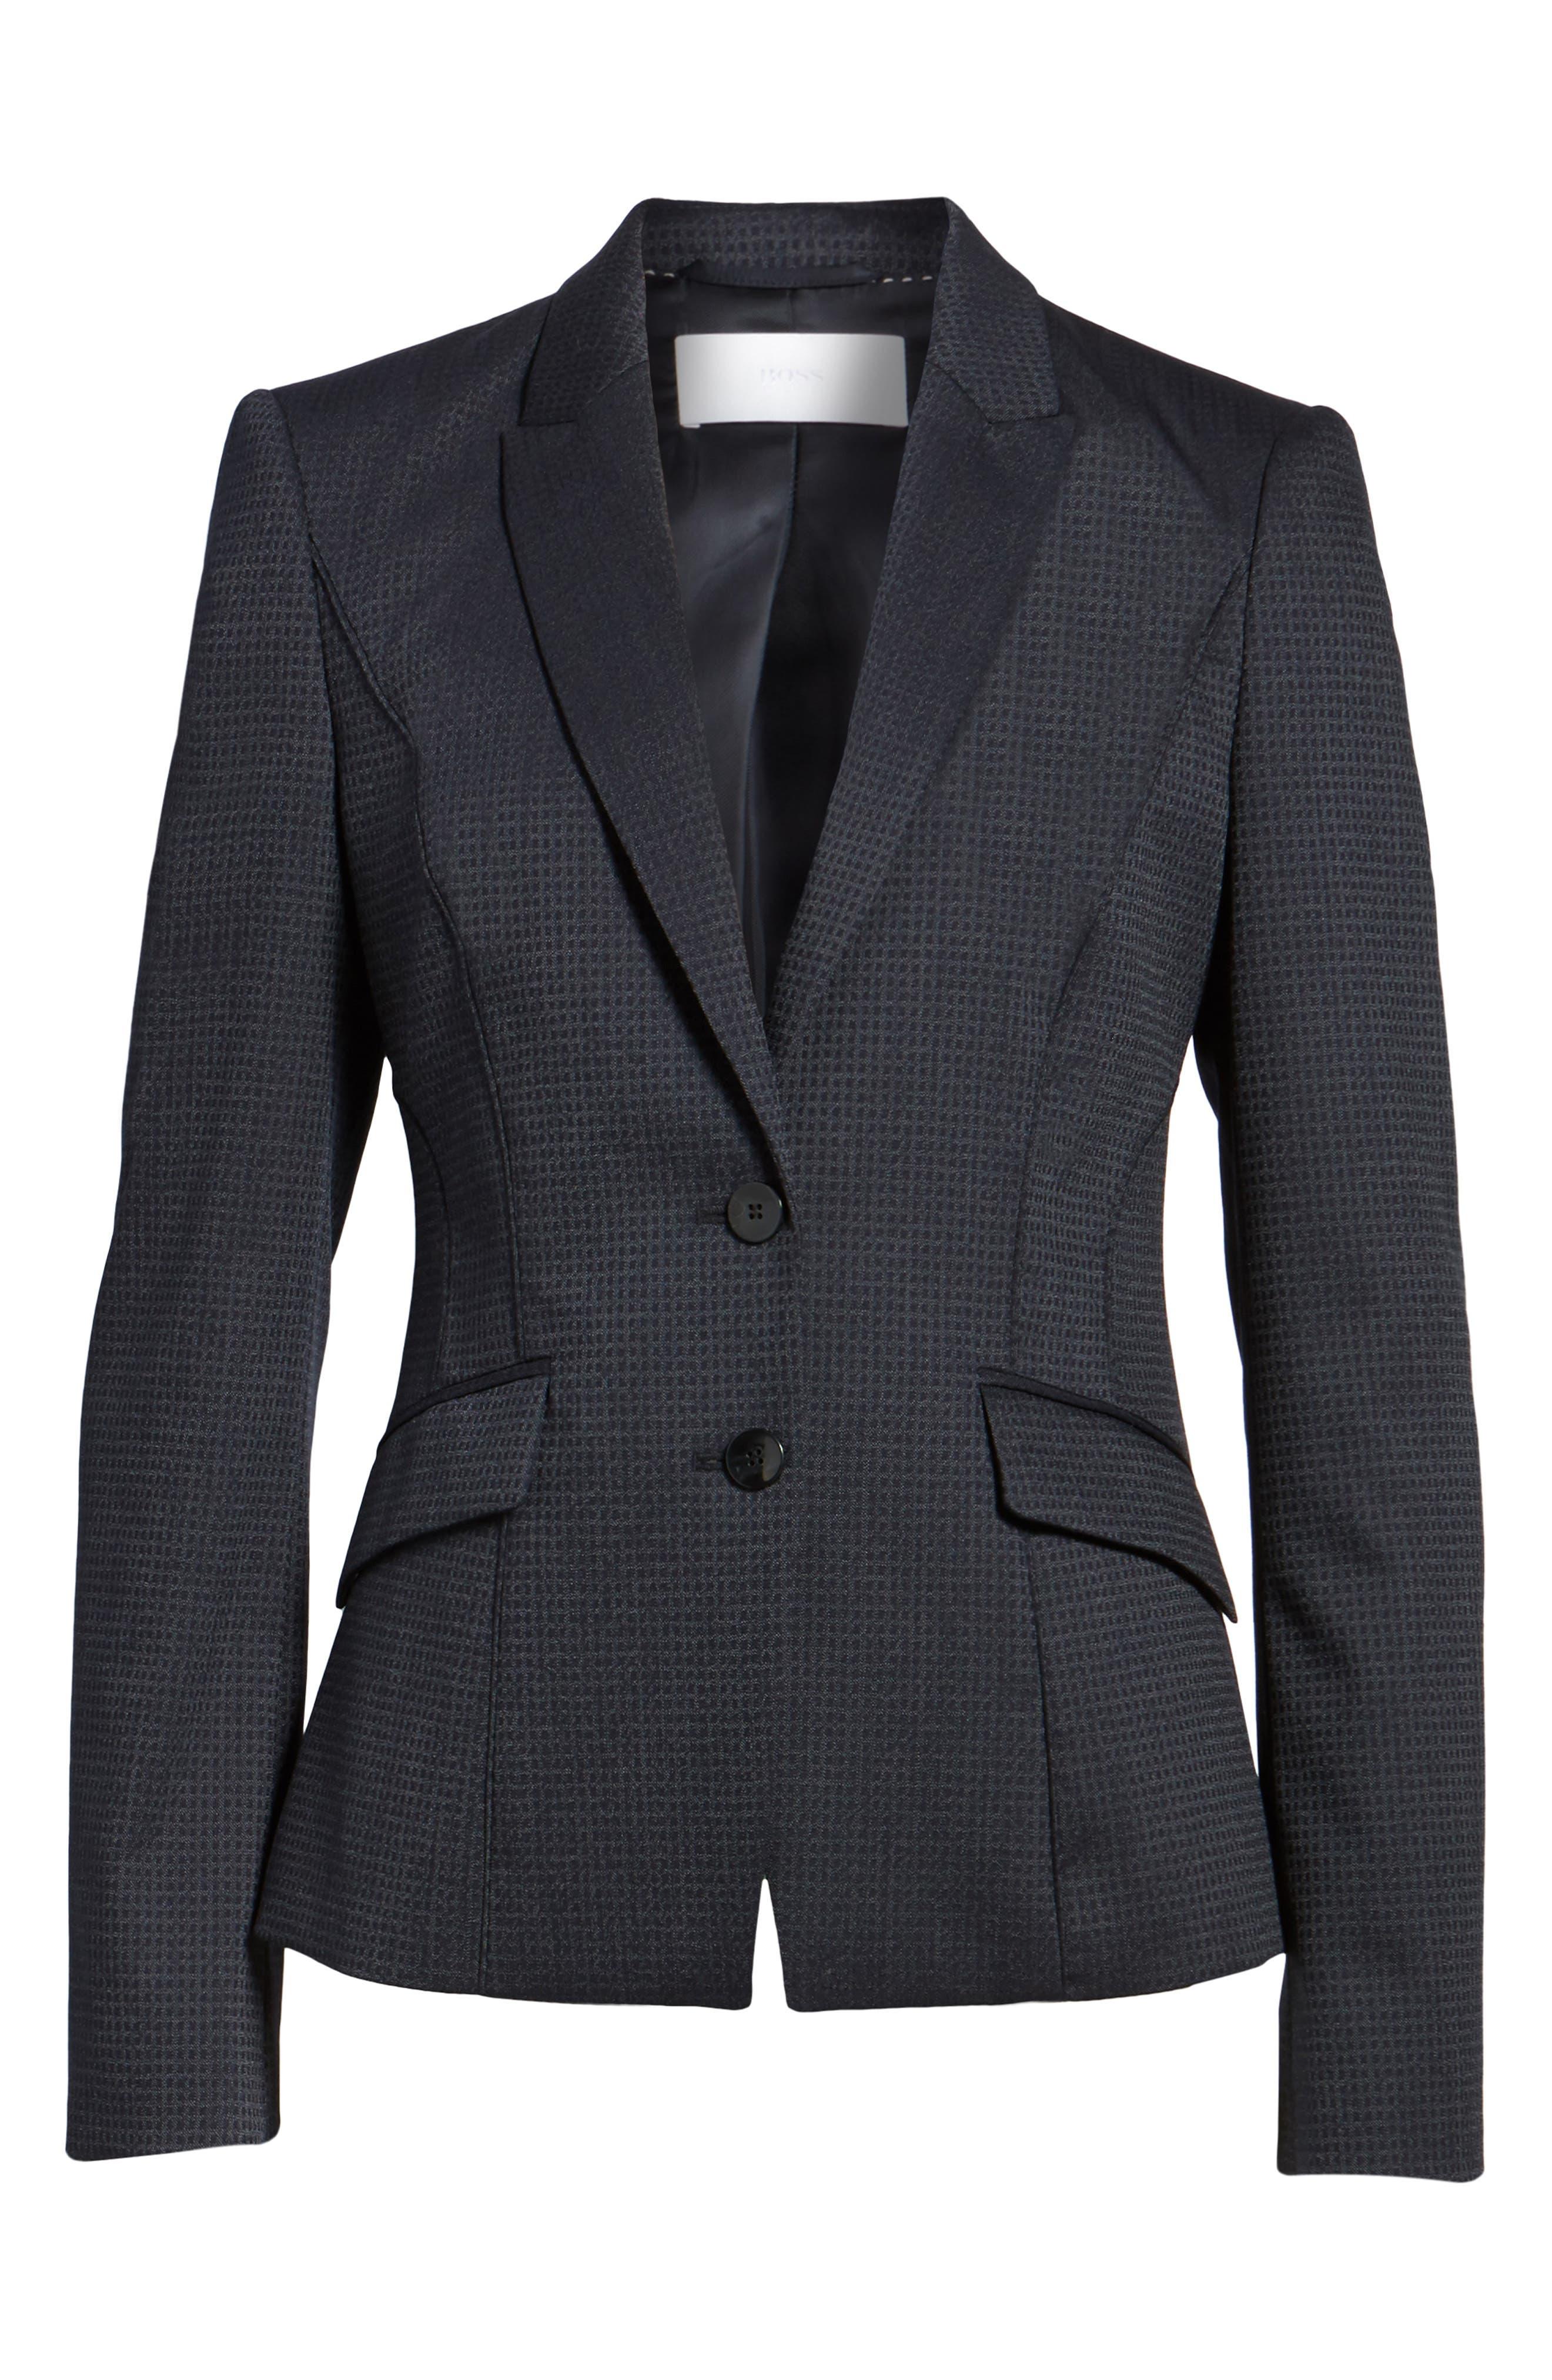 Jukani Check Wool Blend Suit Jacket,                             Alternate thumbnail 10, color,